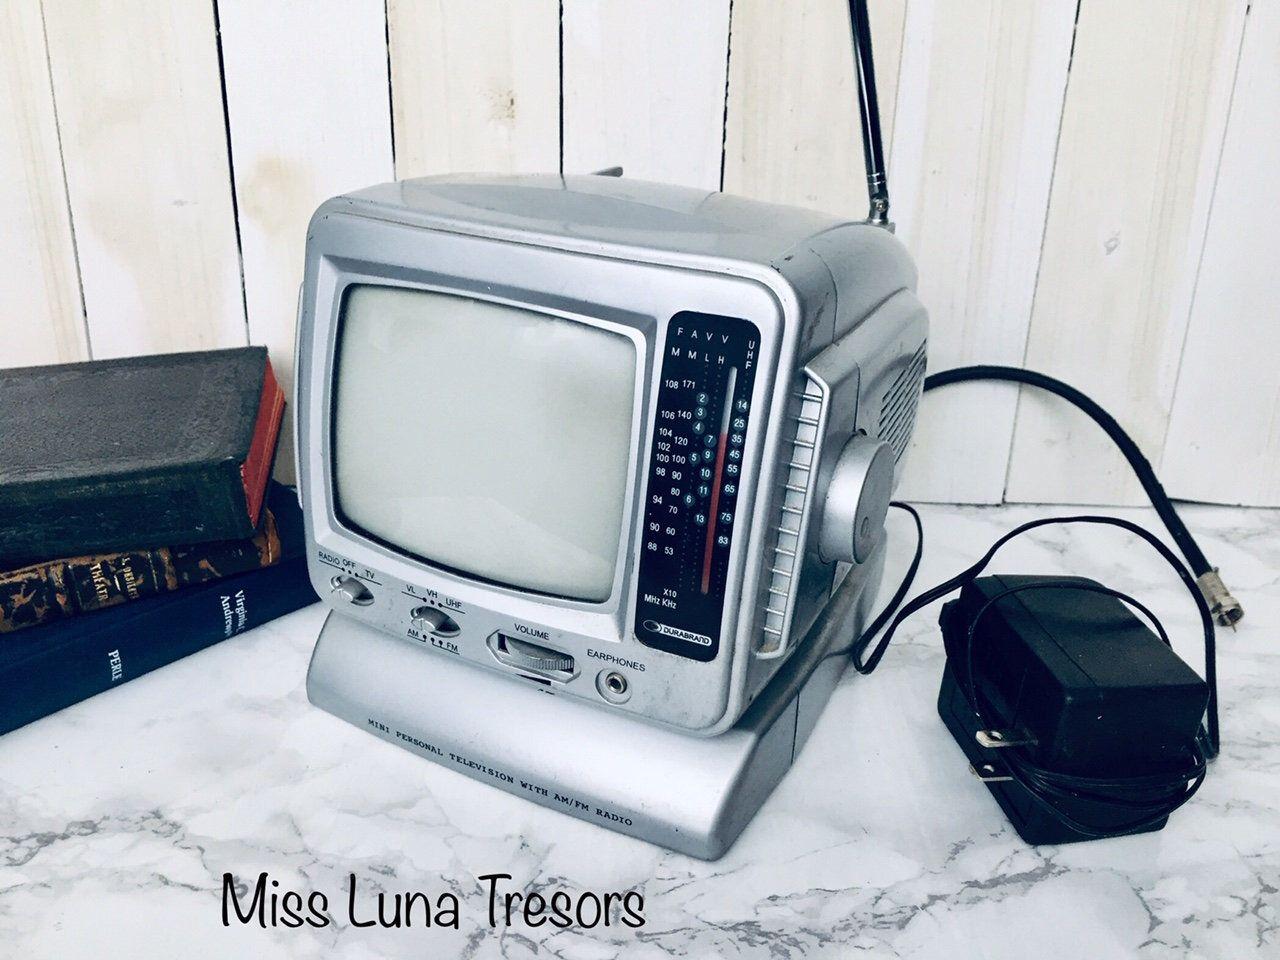 am fm radio portable black and white tv